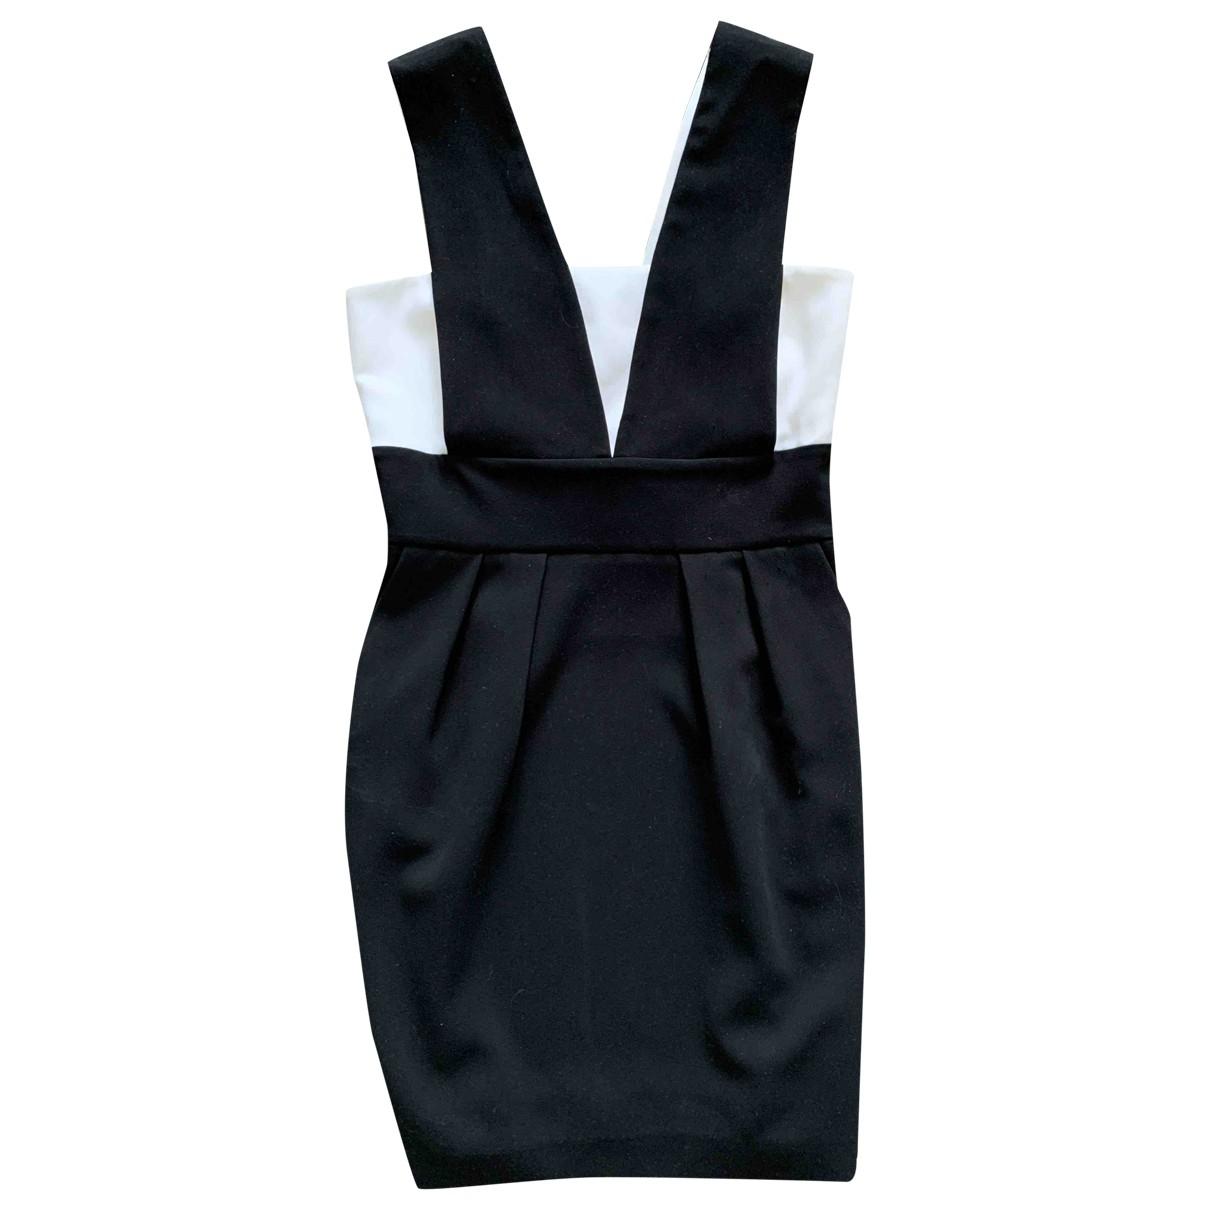 Claudie Pierlot \N Black dress for Women 36 FR